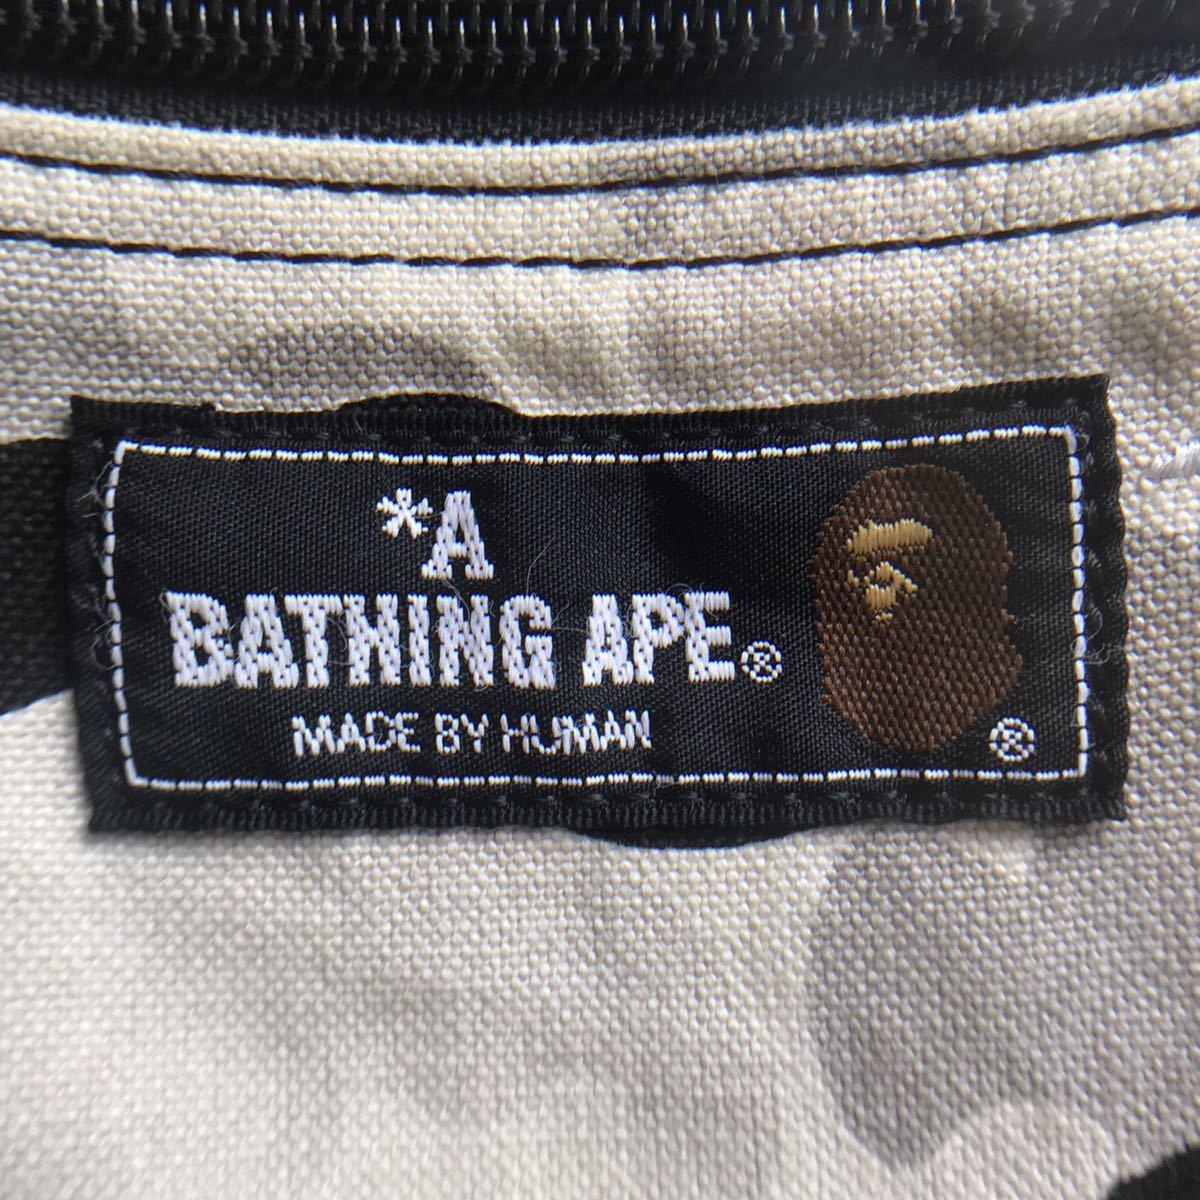 BAPE camo ポーチ a bathing ape BAPE sta マルチケース ベイプ エイプ アベイシングエイプ 迷彩 メイクポーチ BAPEsta スター star